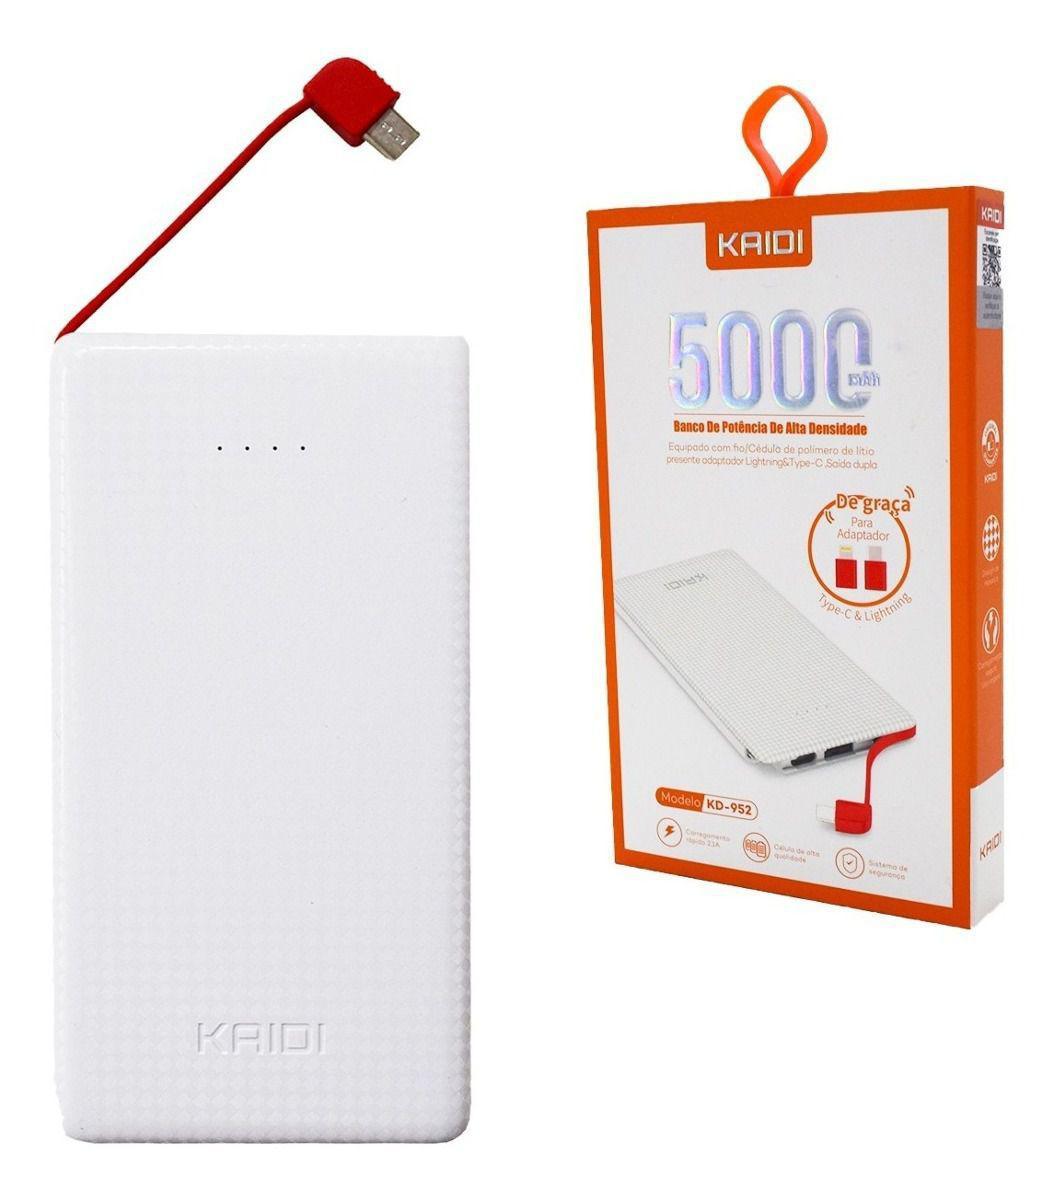 Bateria Externa 5.000mha Kaidi KD-952